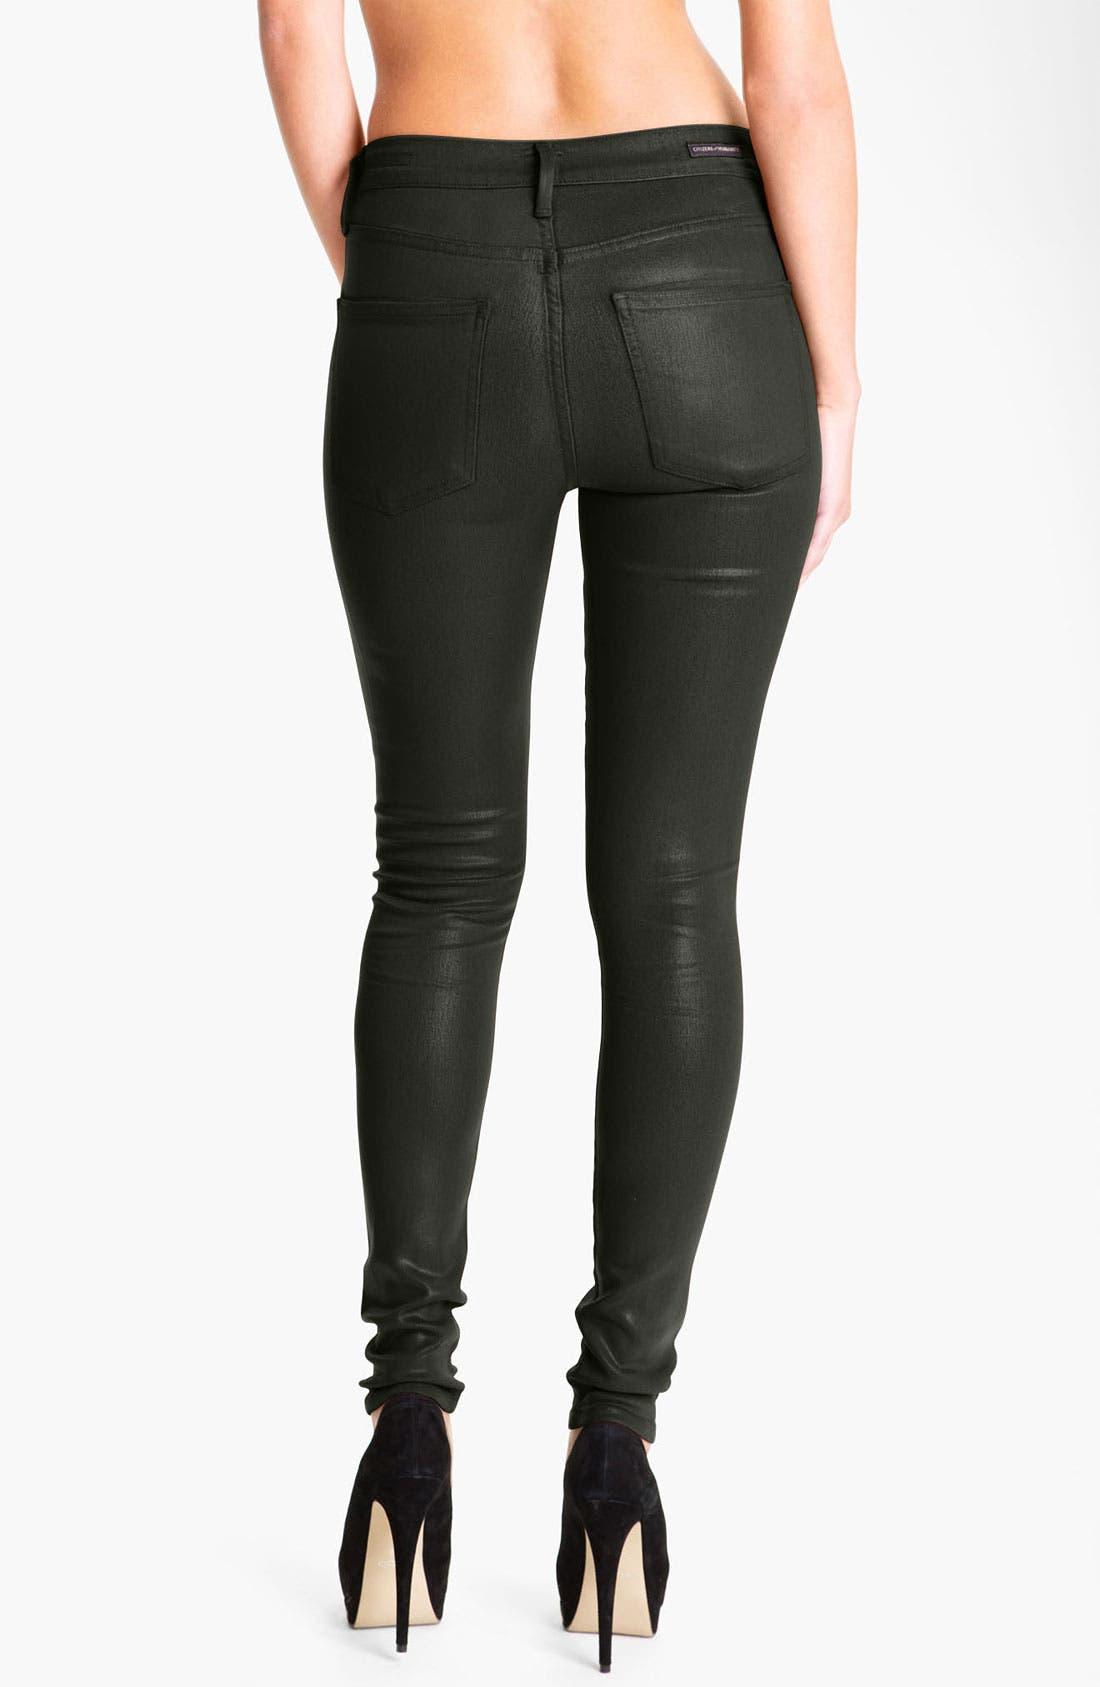 Alternate Image 2  - Citizens of Humanity 'Rocket' Skinny Leatherette Jeans (Dark Ivy)